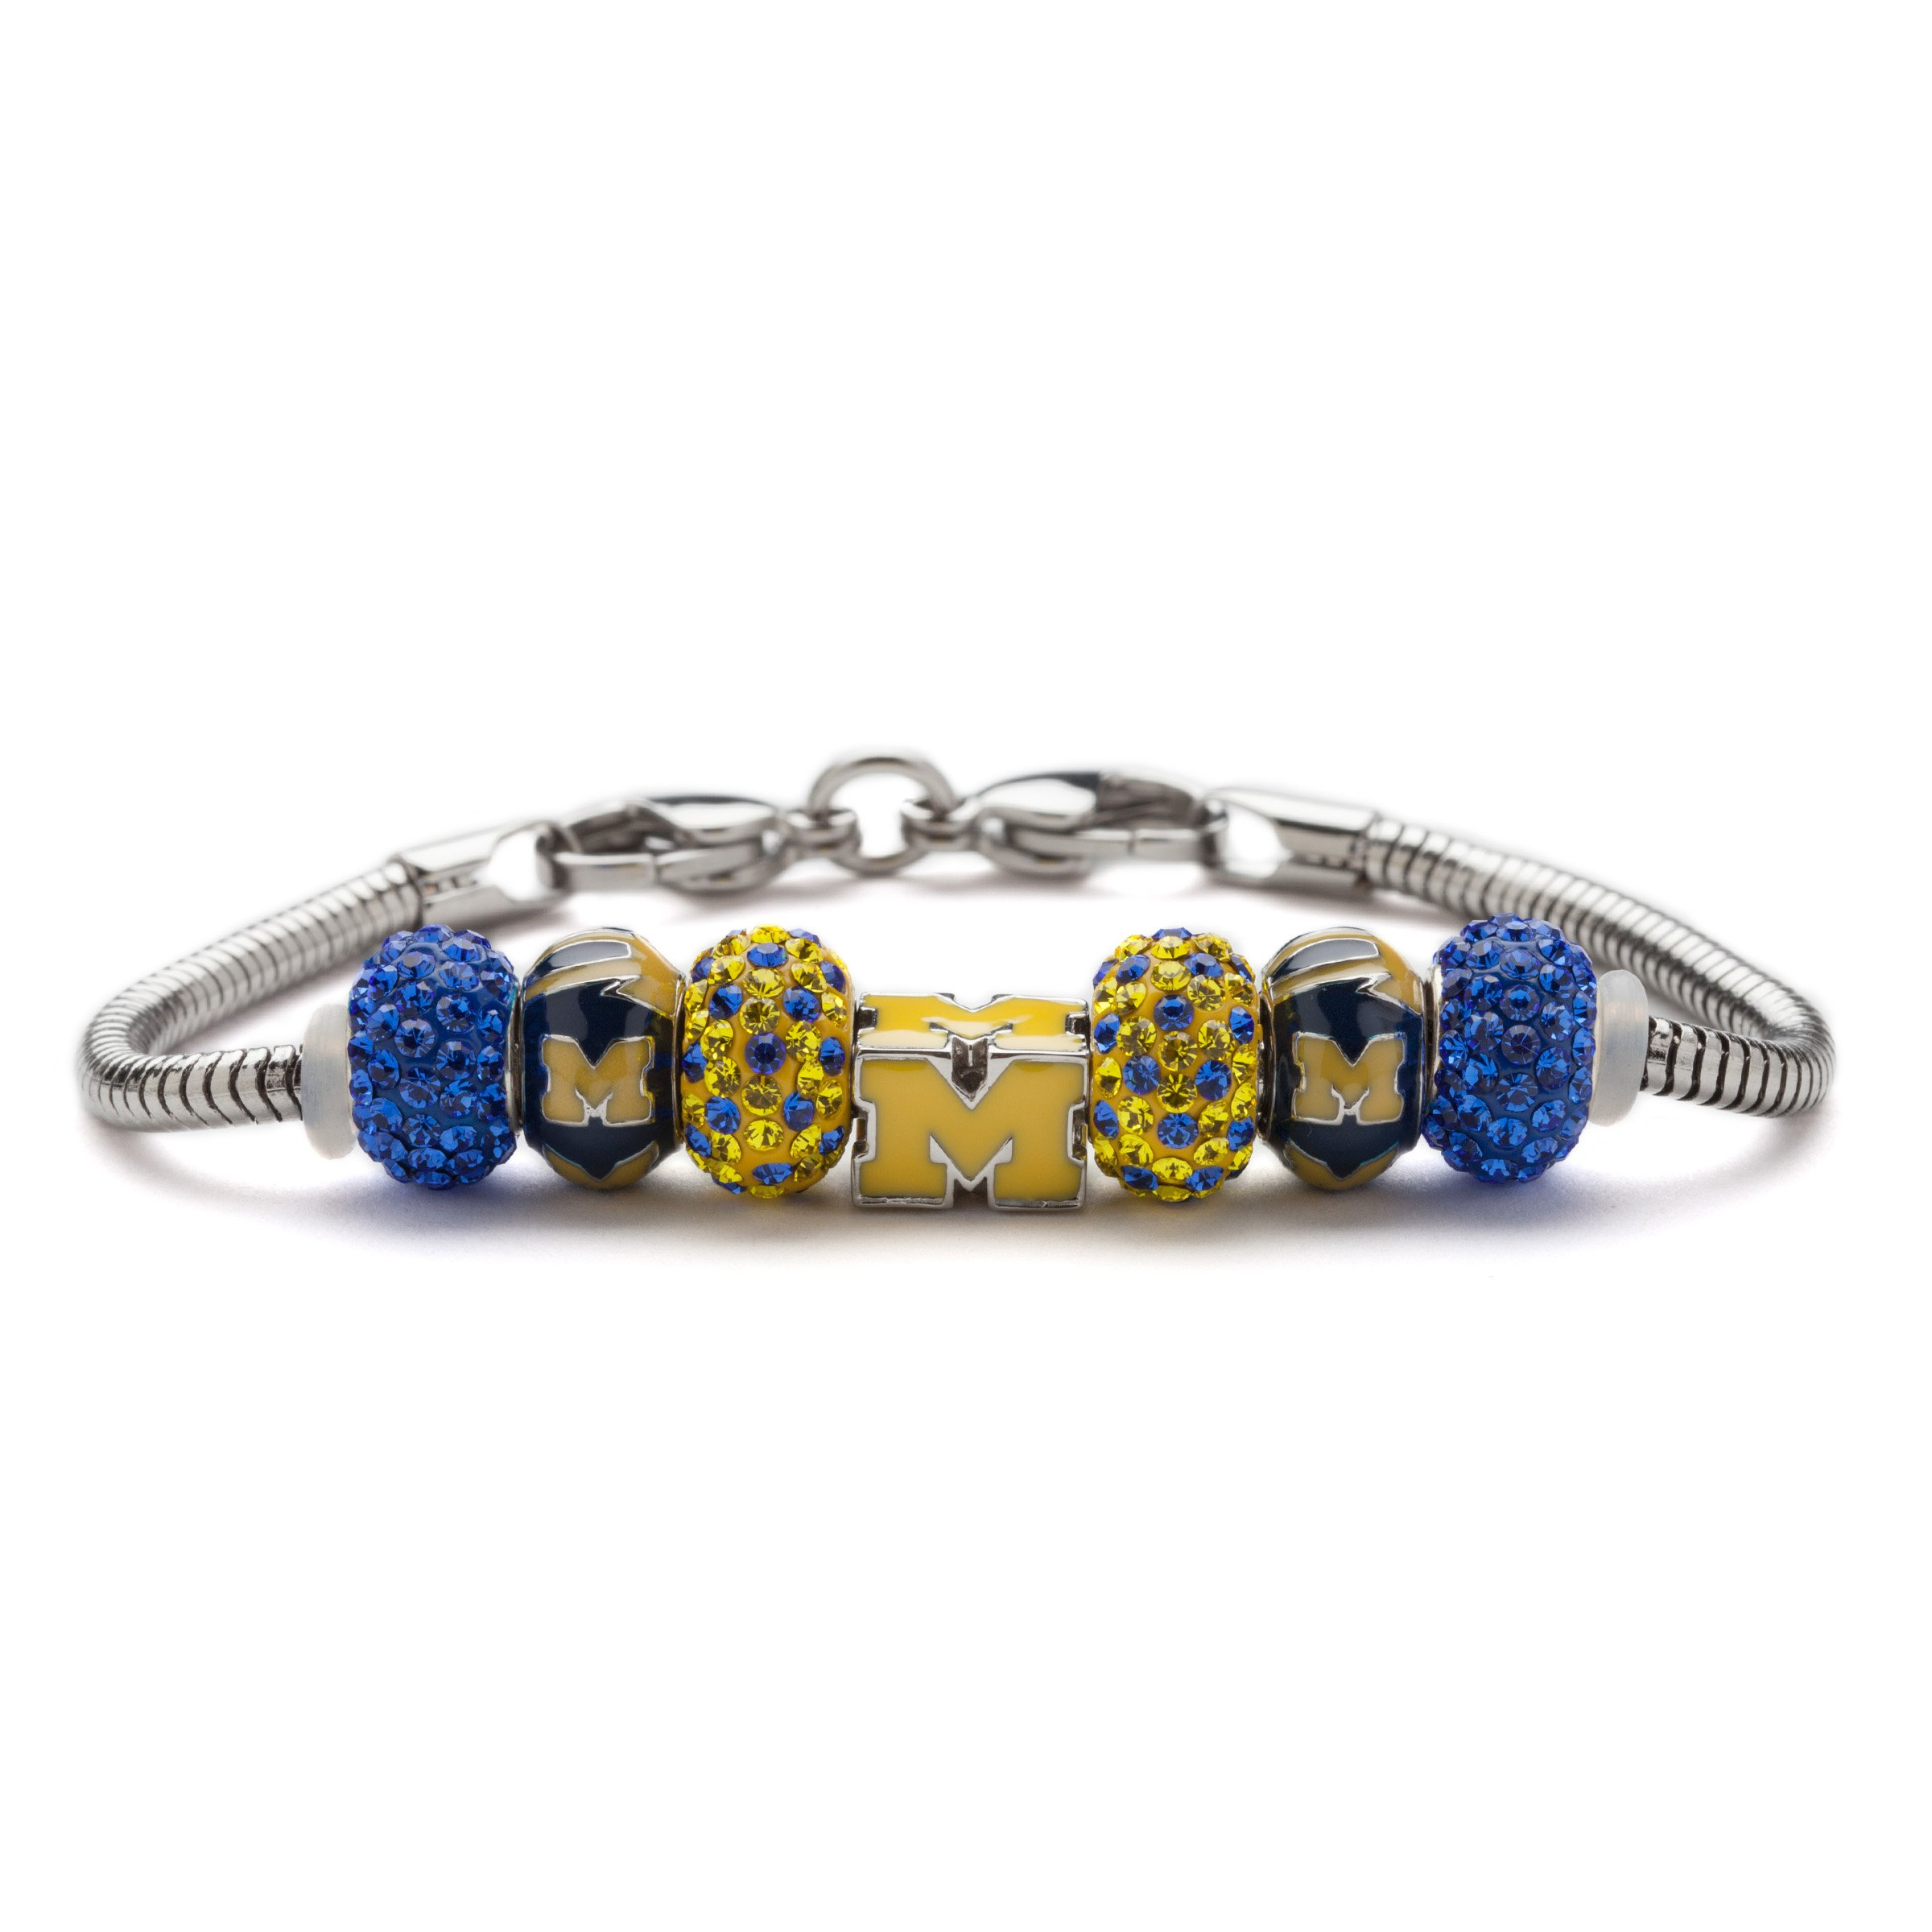 University of Michigan Bracelet   UM M Go Blue Bead Charm Bracelet   Officially Licensed University of Michigan Jewelry   UM Gifts   Michigan Wolverines   UM Jewelry   Stainless Steel